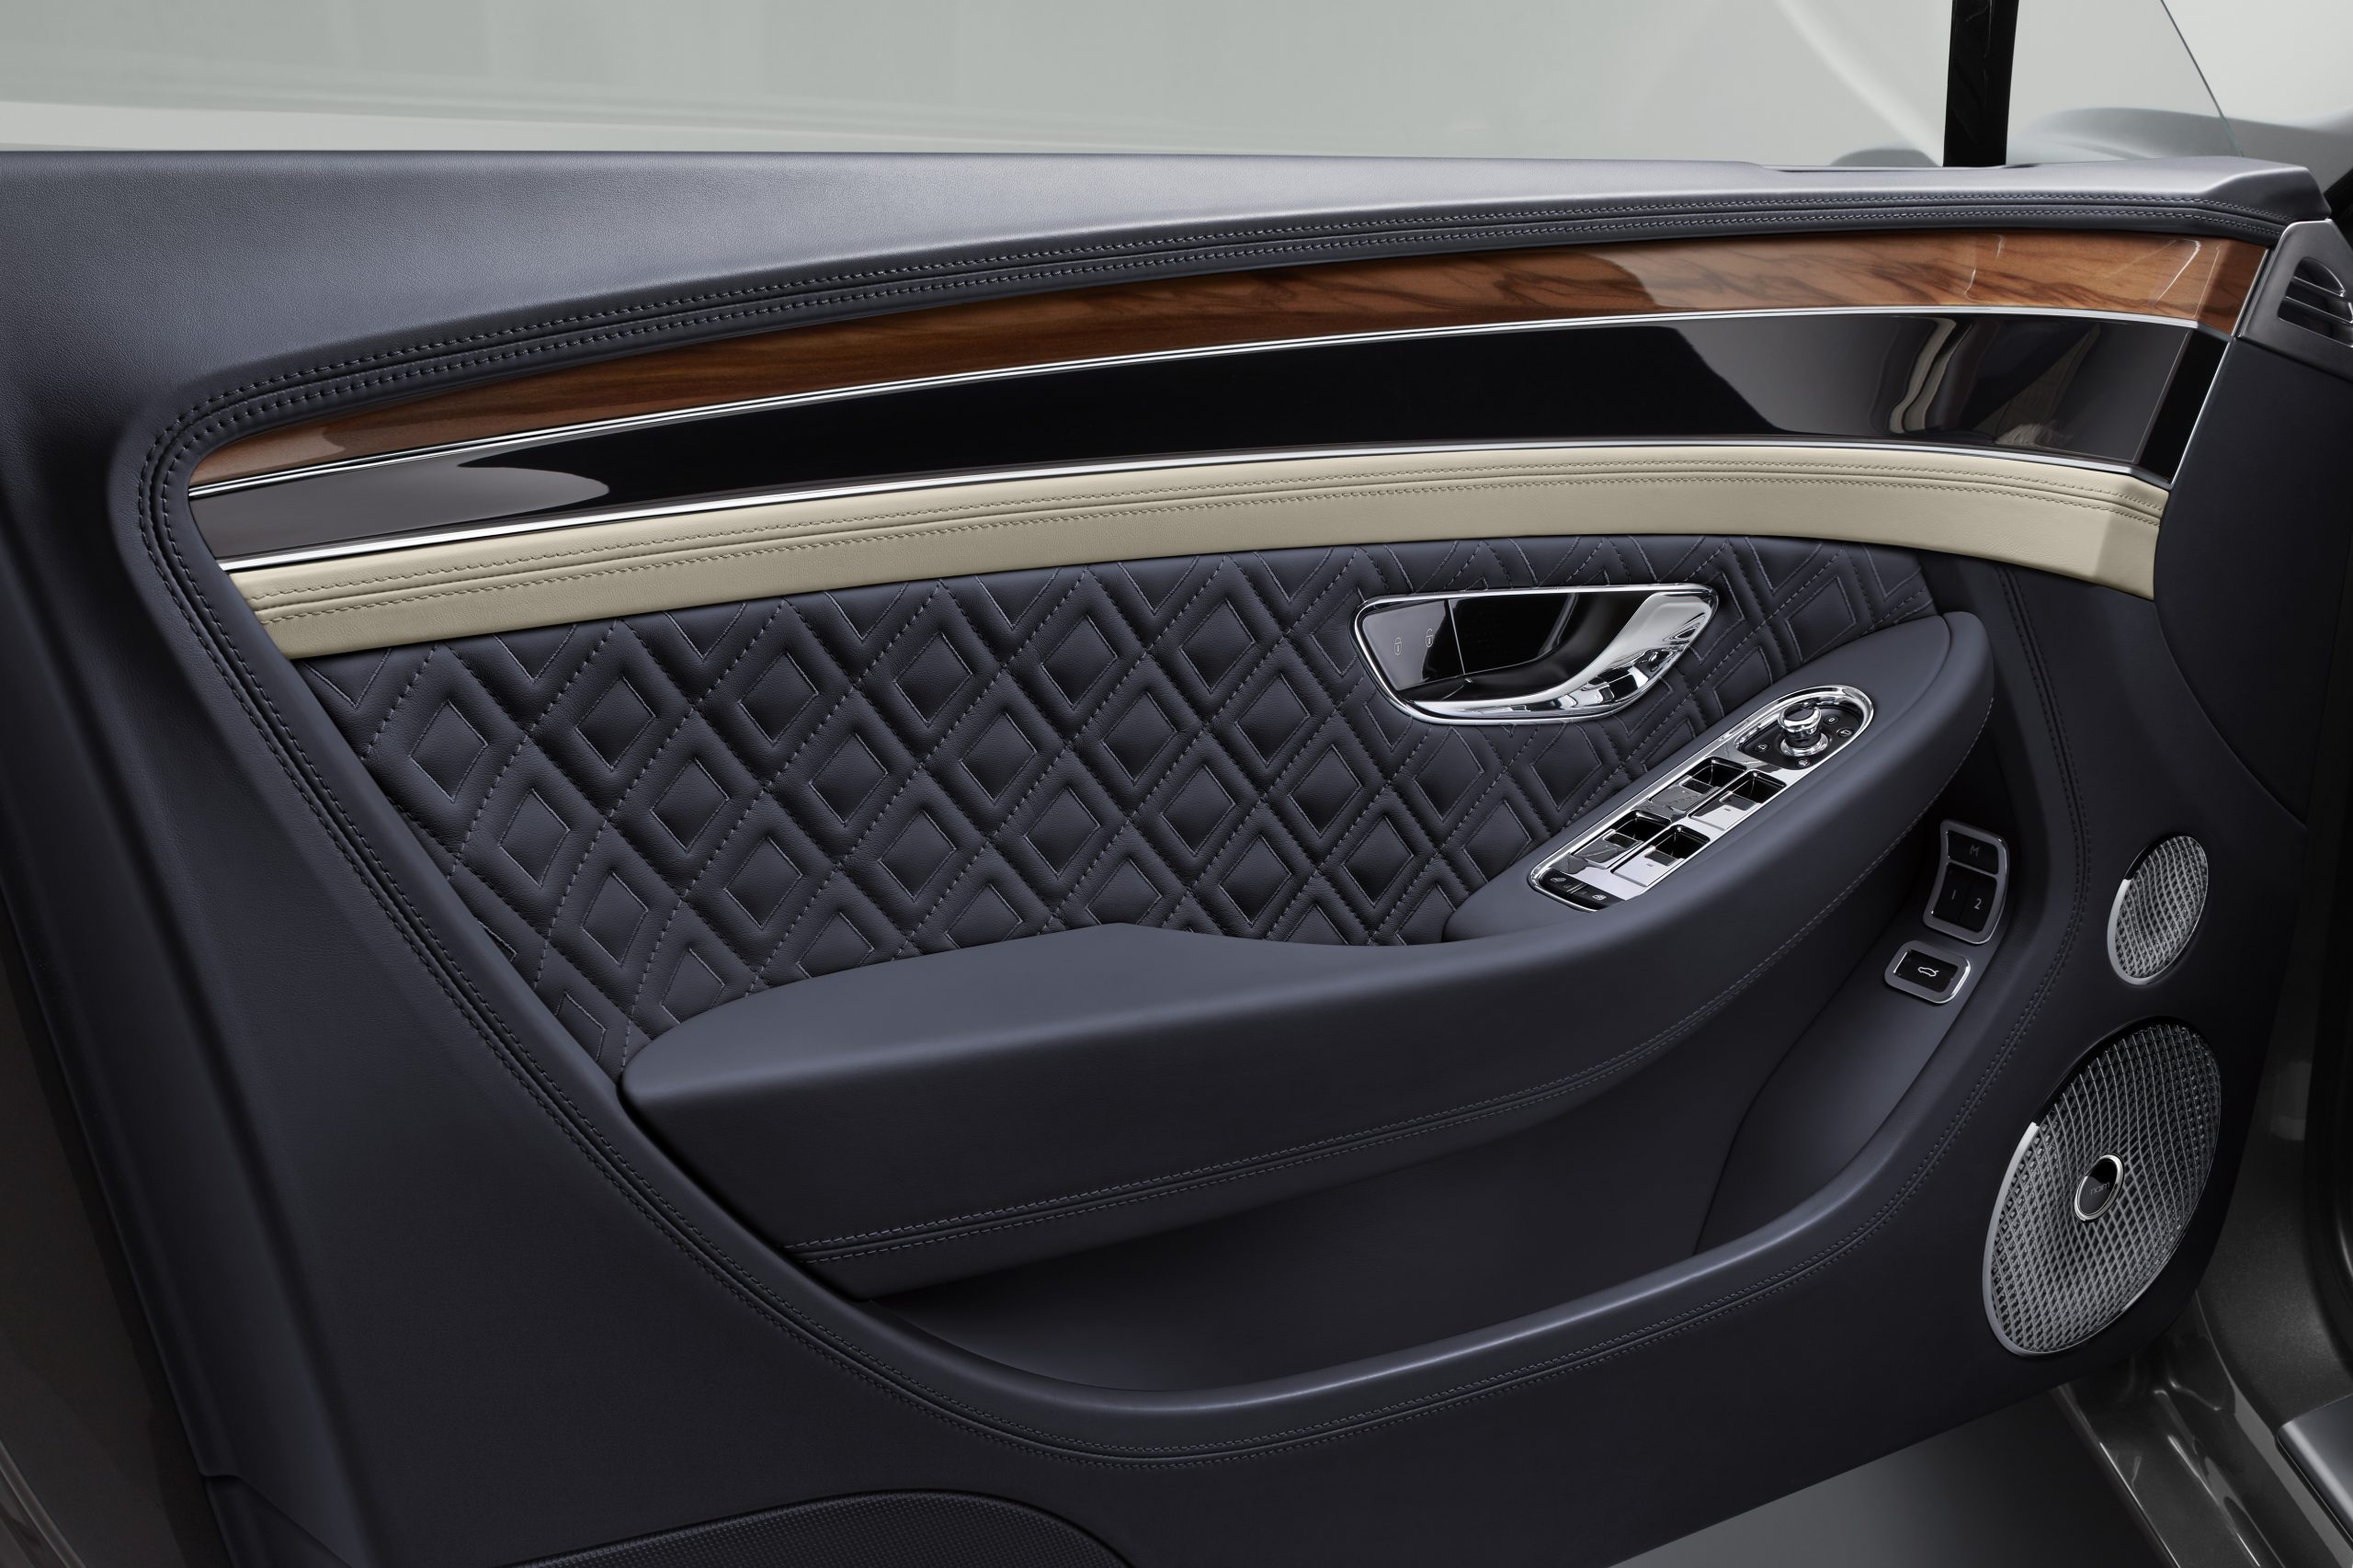 Interior designs of the Bentley Continental GT